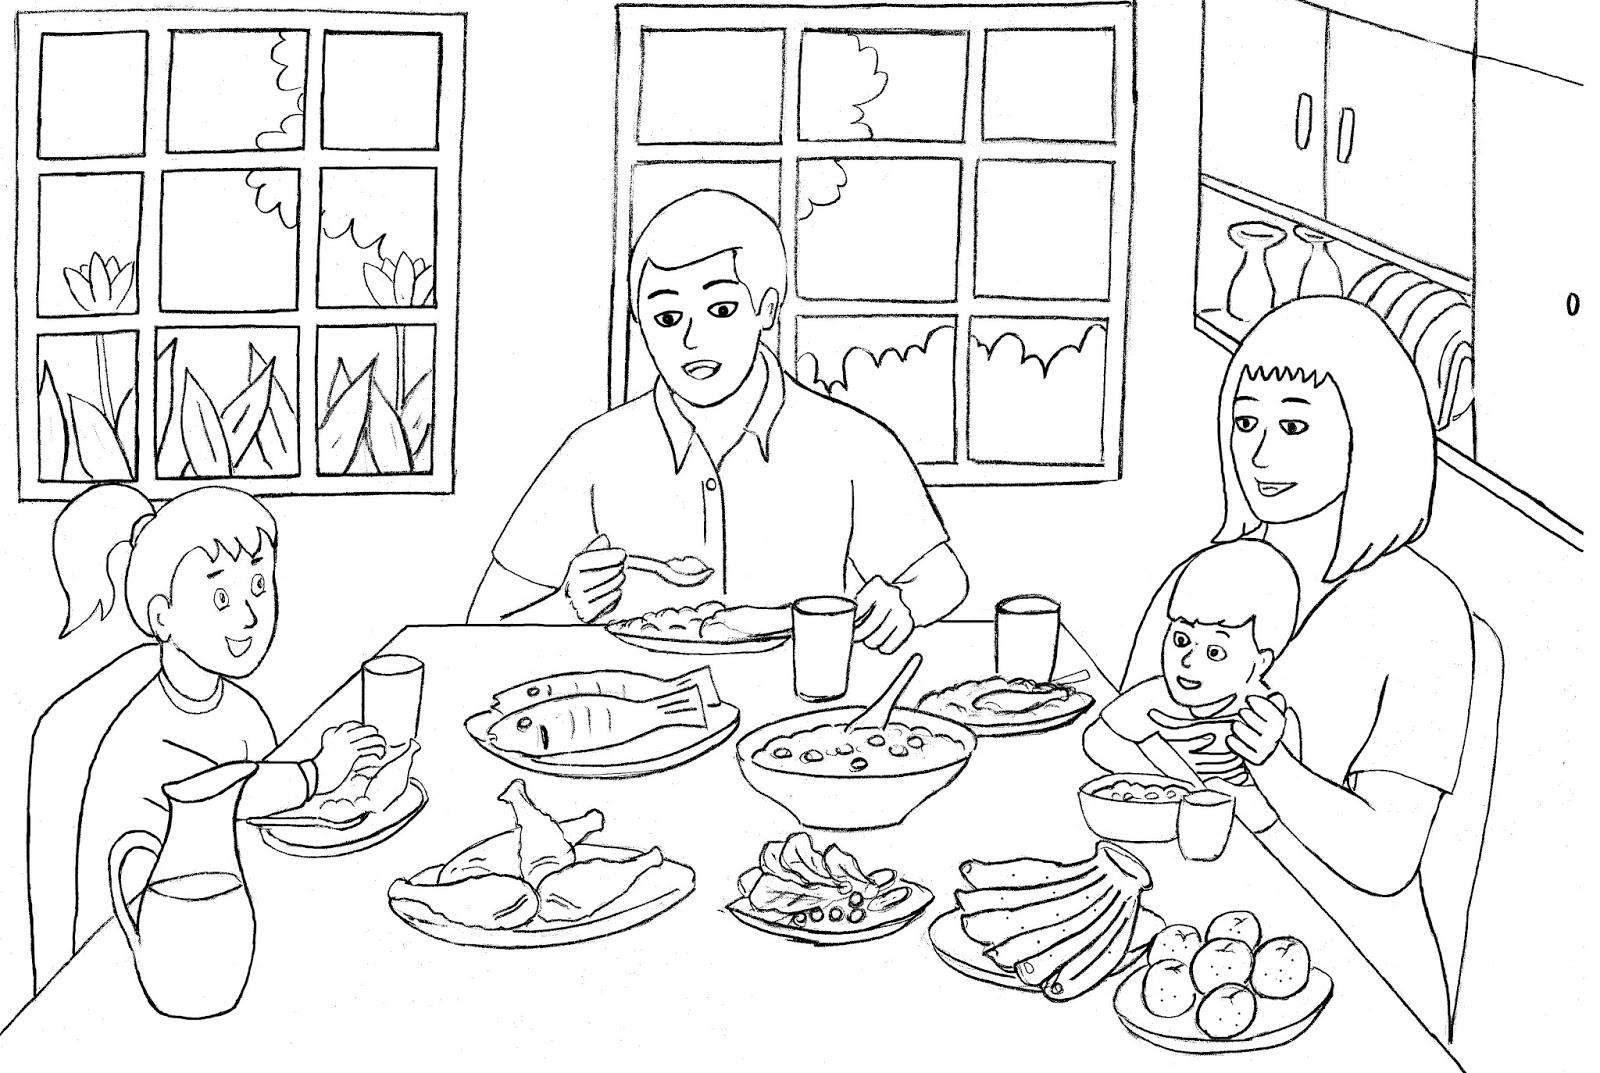 Mewarnai Gambar Untuk Anak Anak Gambar Mewarnai Tema Keluarga